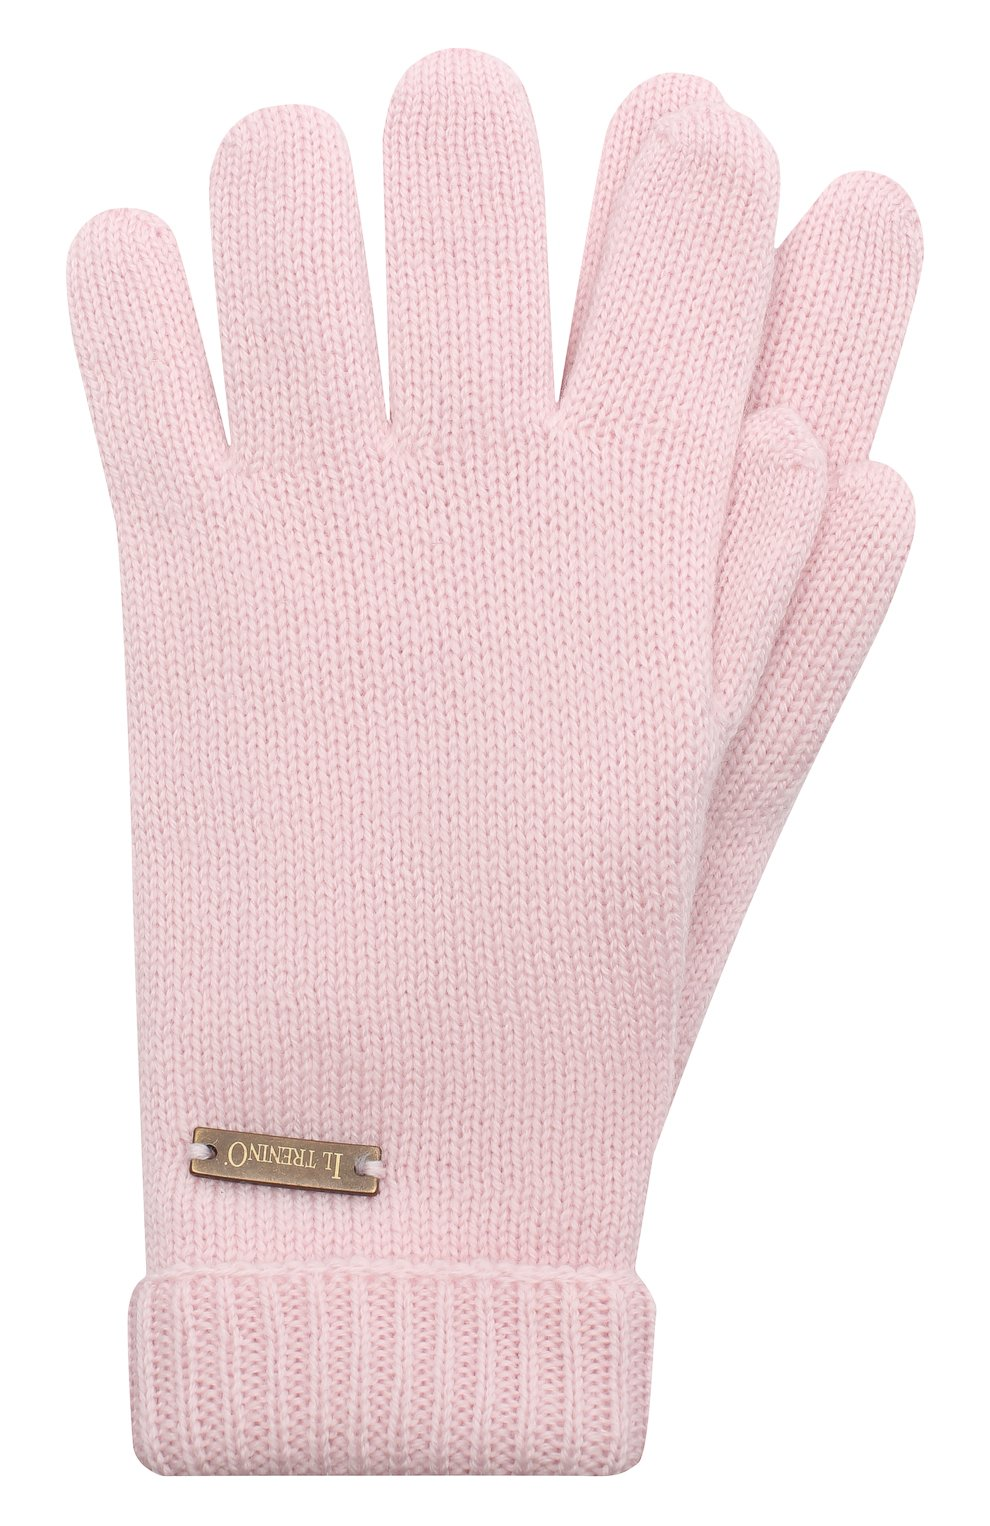 Детские шерстяные перчатки IL TRENINO розового цвета, арт. 20 4063/E0 | Фото 1